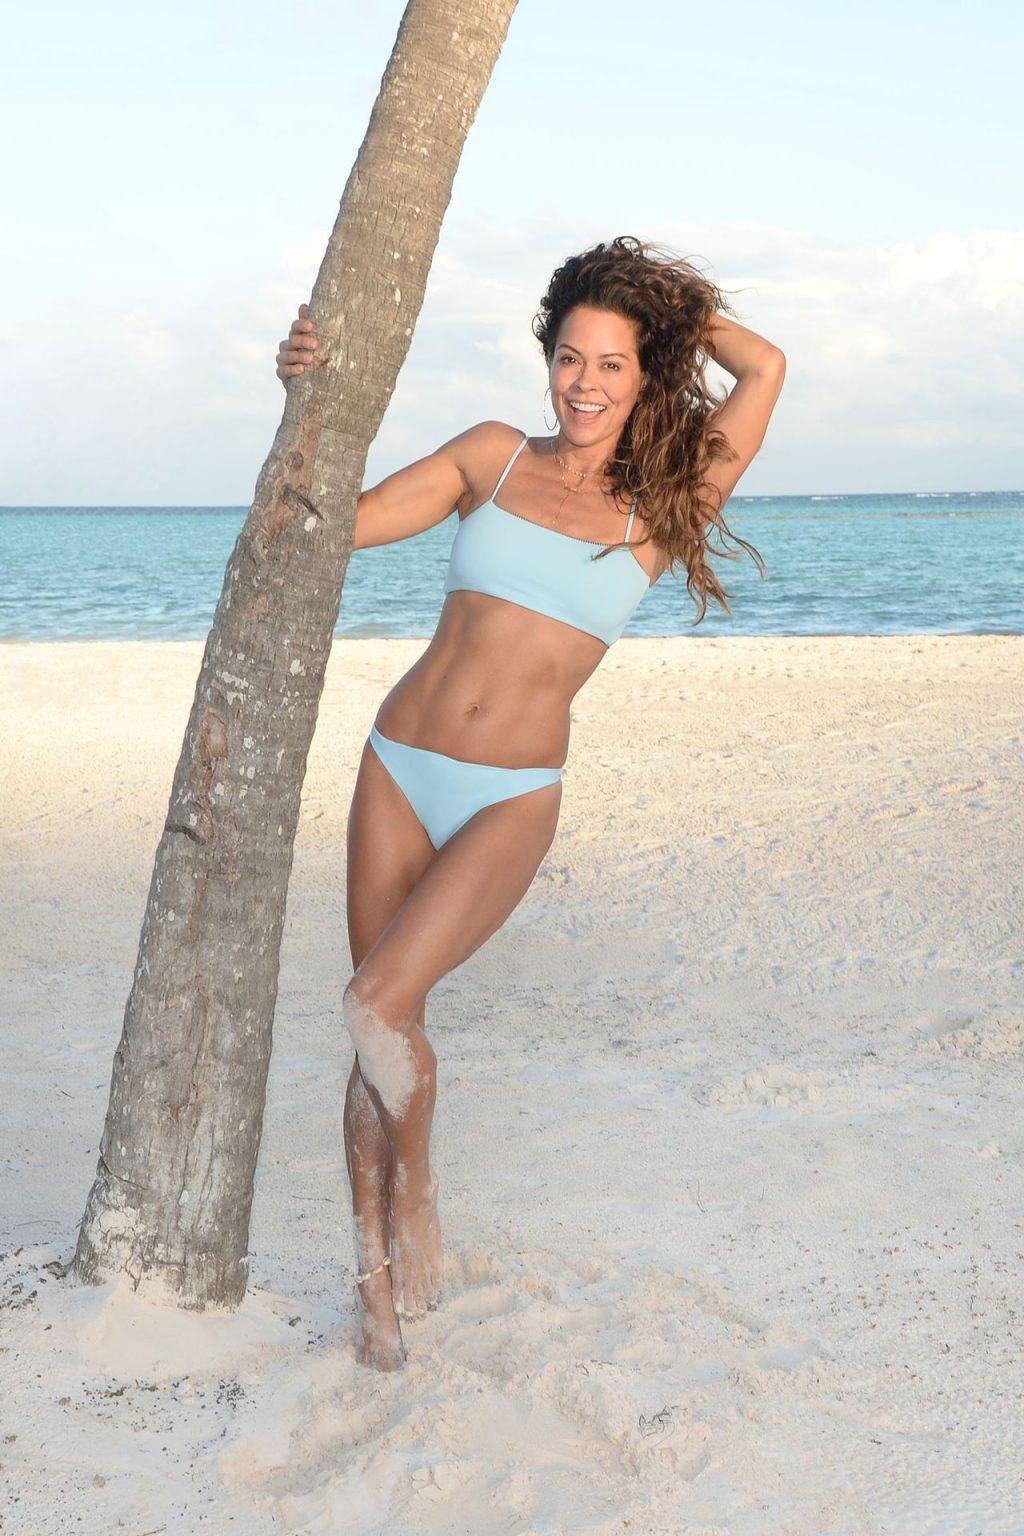 Brooke Burke Poses on the Beach at the Hyatt Zilara (32 Photos)